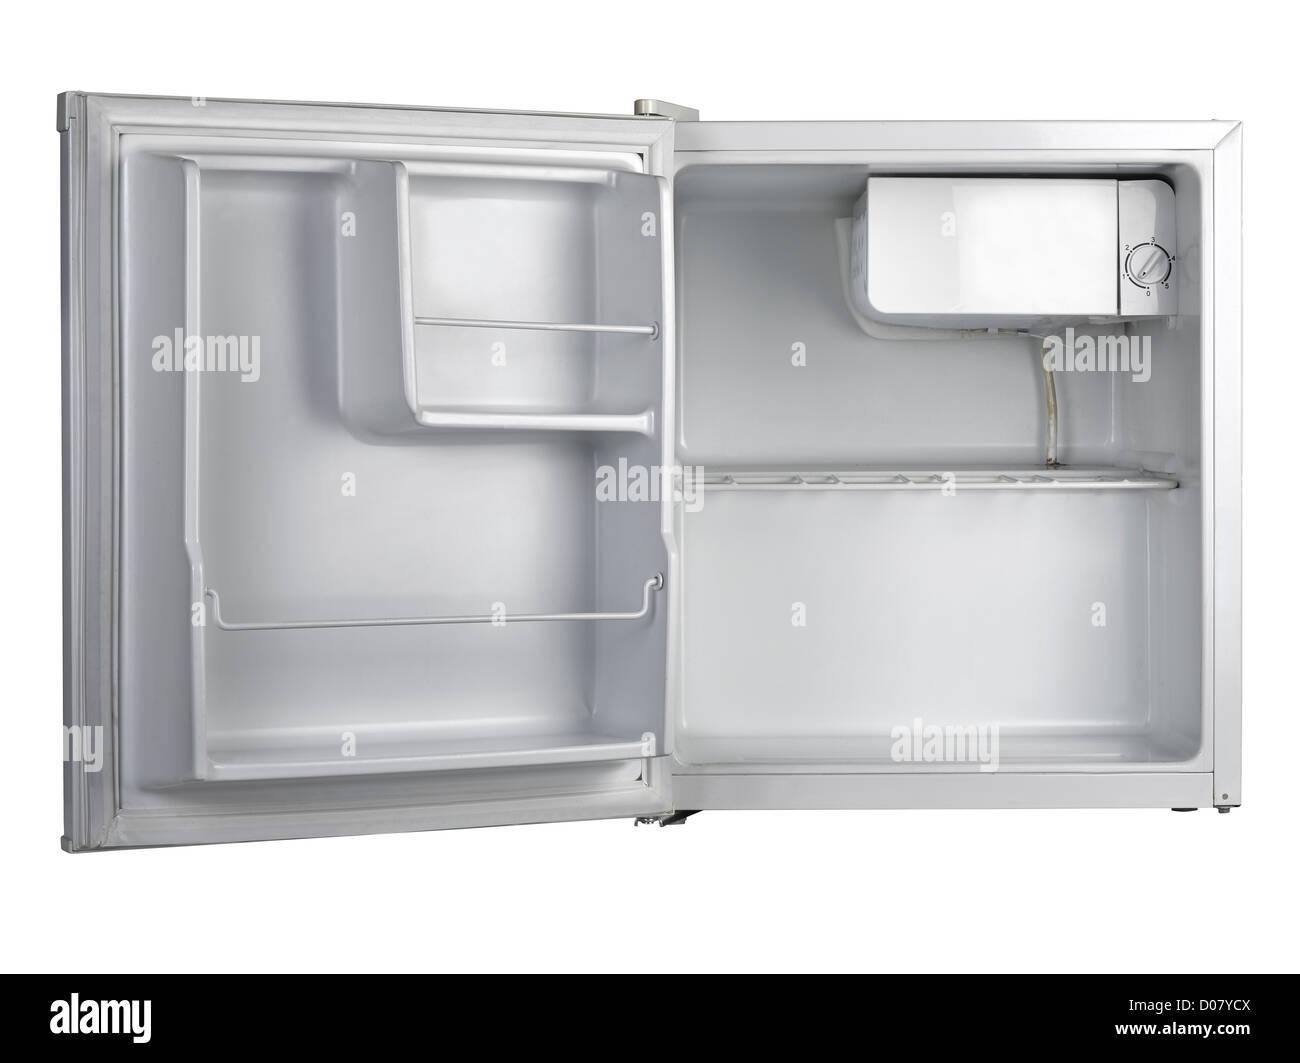 Red Bull Kühlschrank Dj Cooler : Großer kühlschrank stockfotos großer kühlschrank bilder alamy